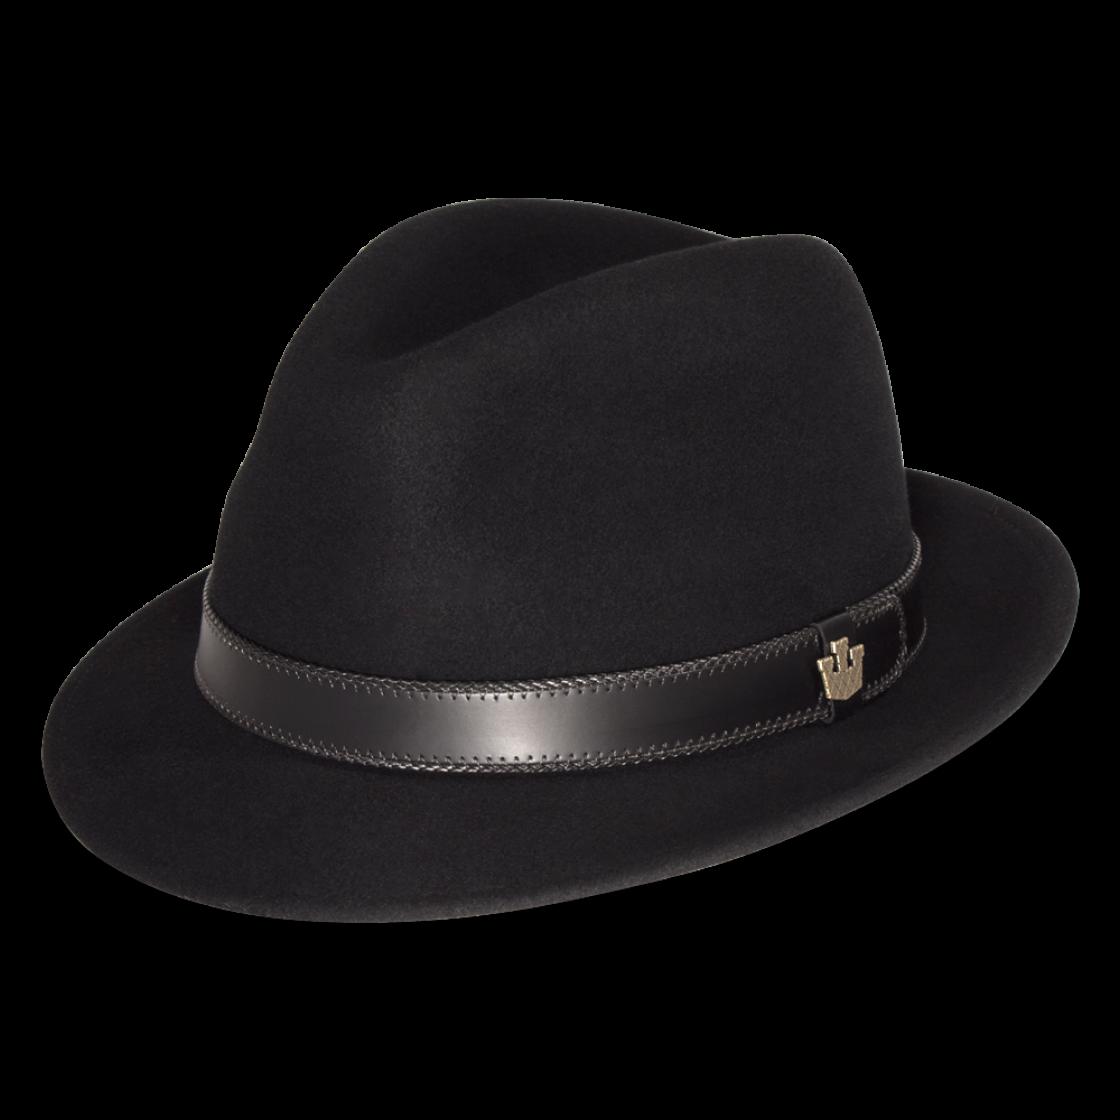 шляпа PNG фото